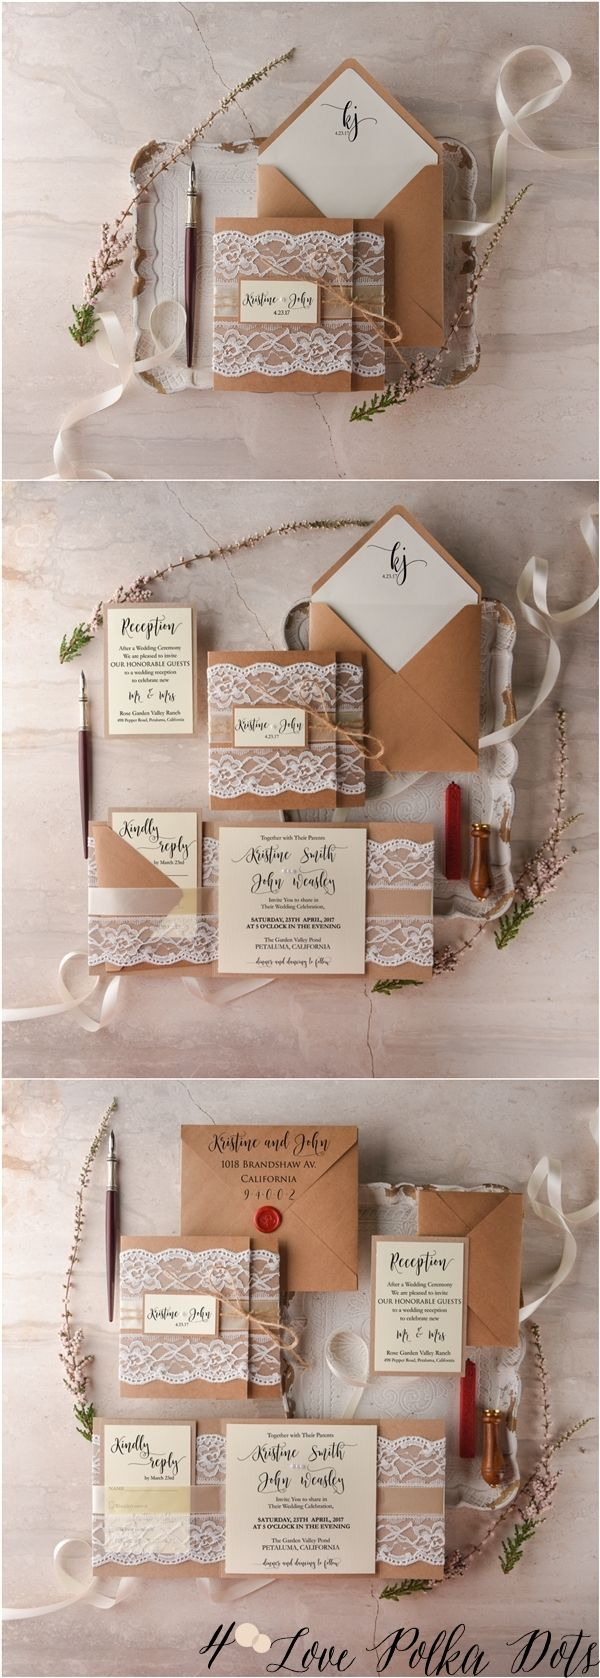 kraft wedding invitations plantable wedding invitations Rustic kraft paper and lace wedding invitations rusticwedding countrywedding weddingideas